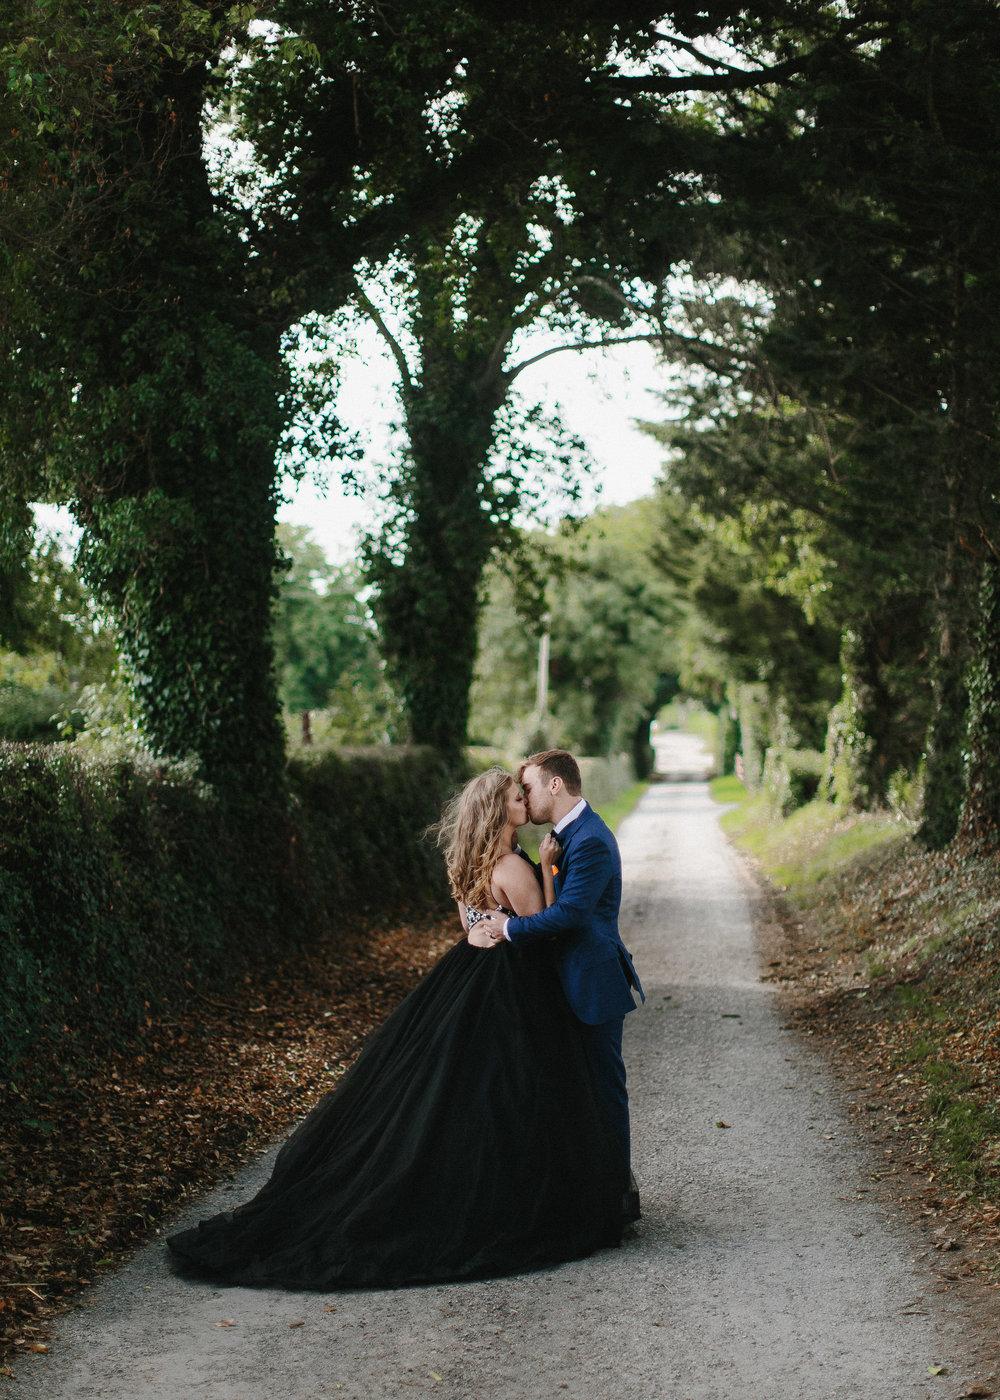 ireland_elopement_black_wedding_dress_wicklow_glendalough_athy_st_kevins_way_1683.jpg